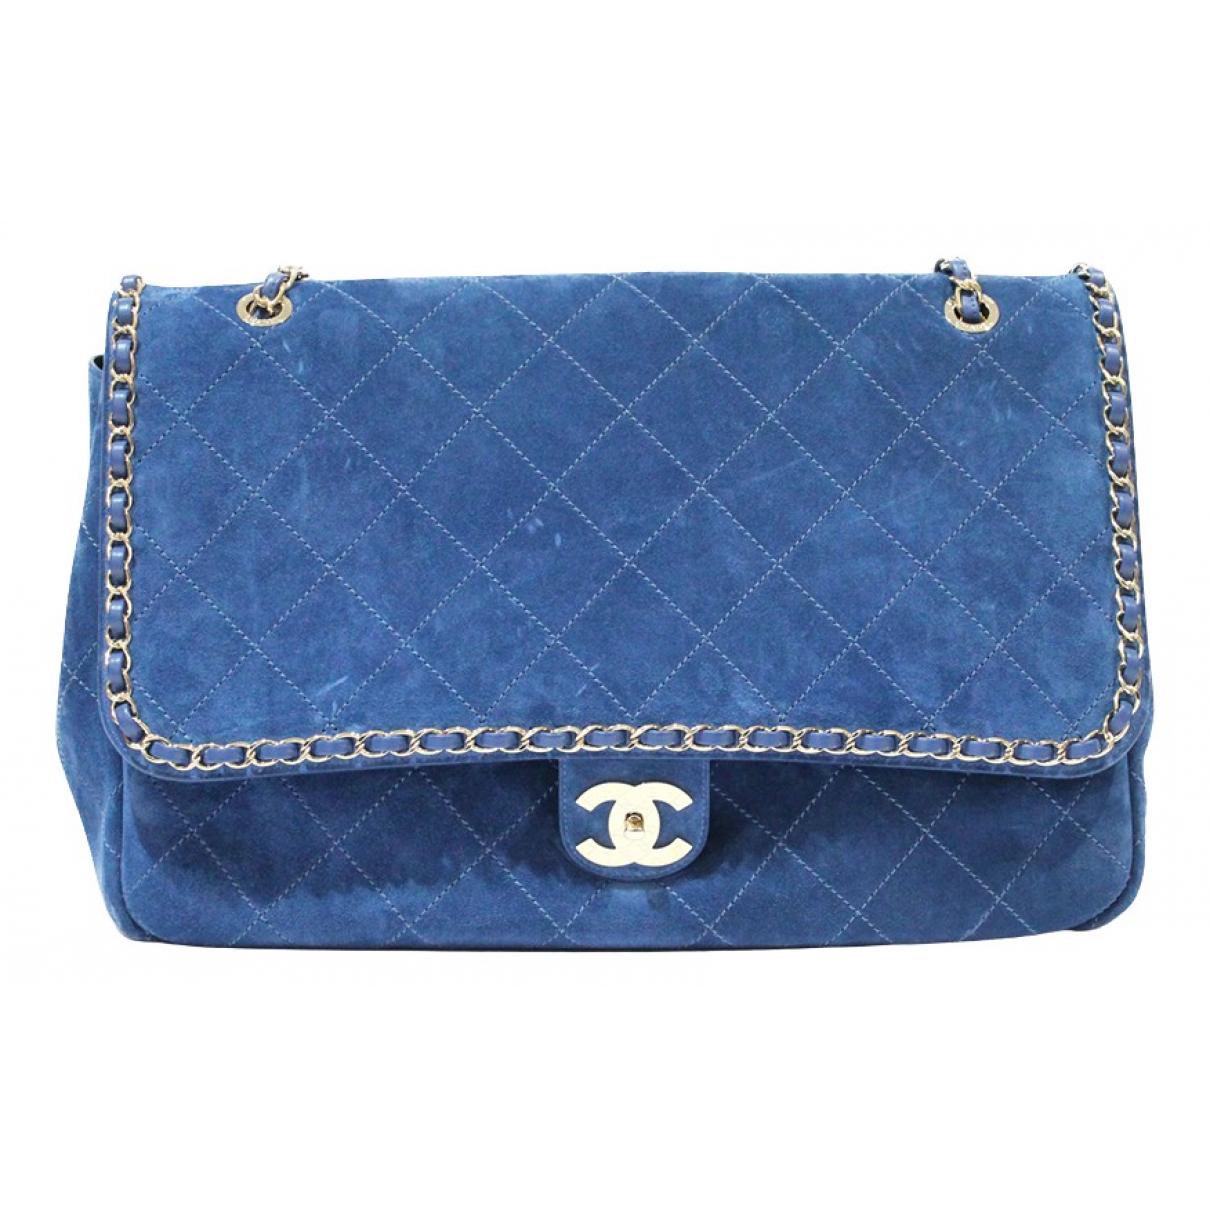 Chanel Timeless/Classique Handtasche in  Blau Veloursleder